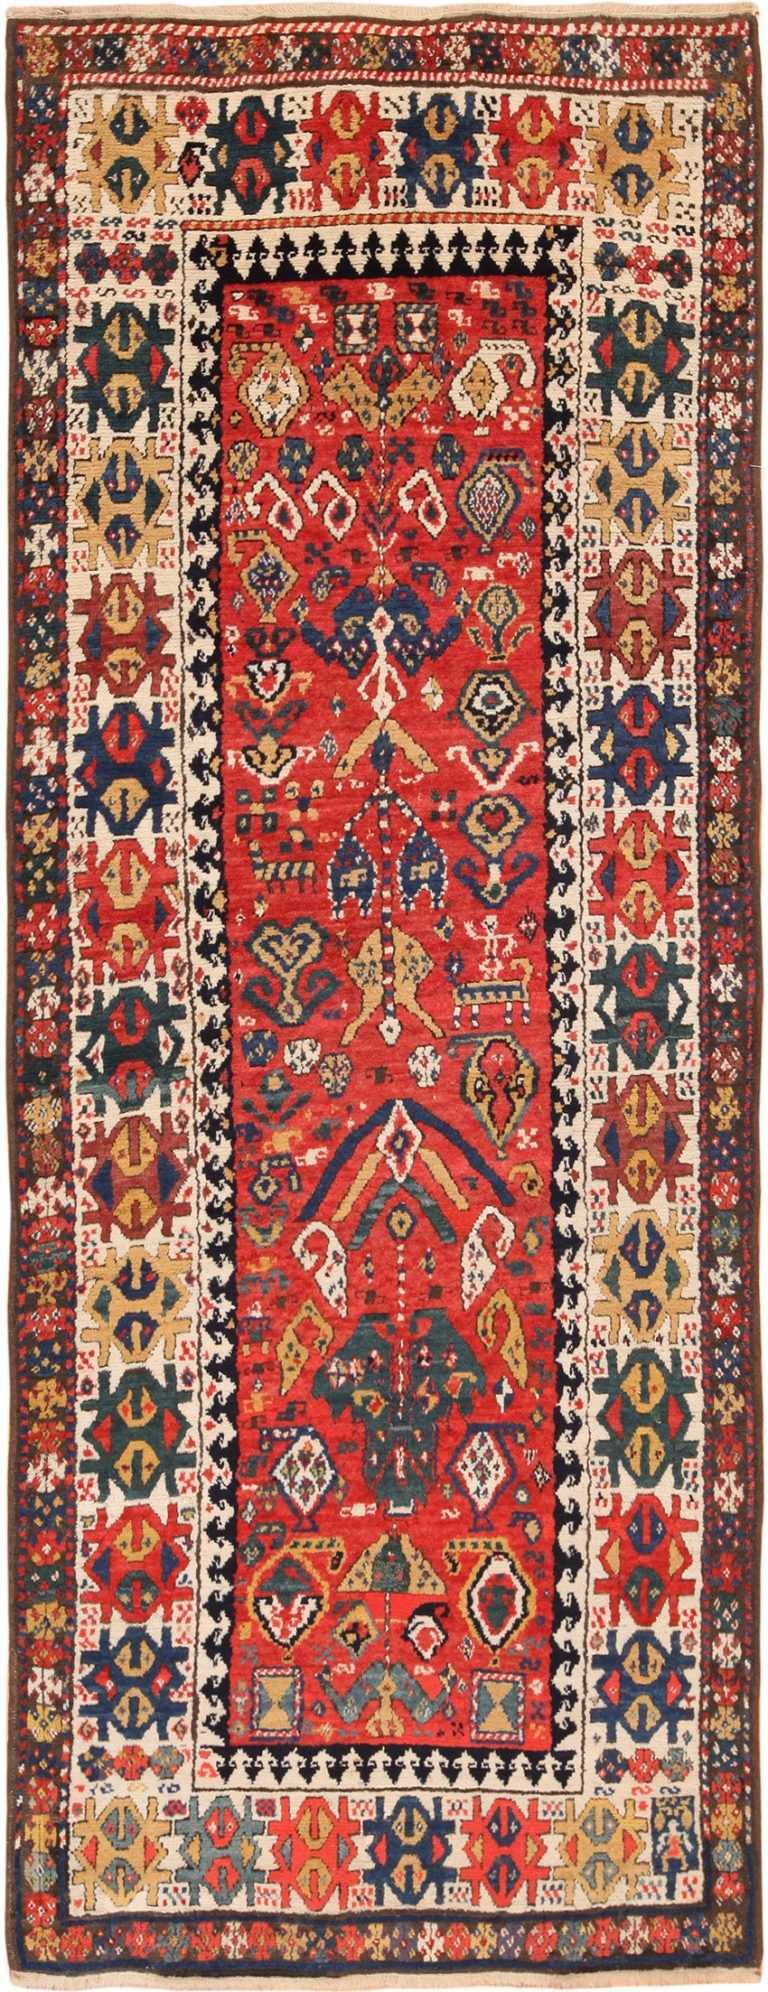 Full view Antique Caucasian Kazak Runner Rug #70122 Nazmiyal Antique Rugs in NYC